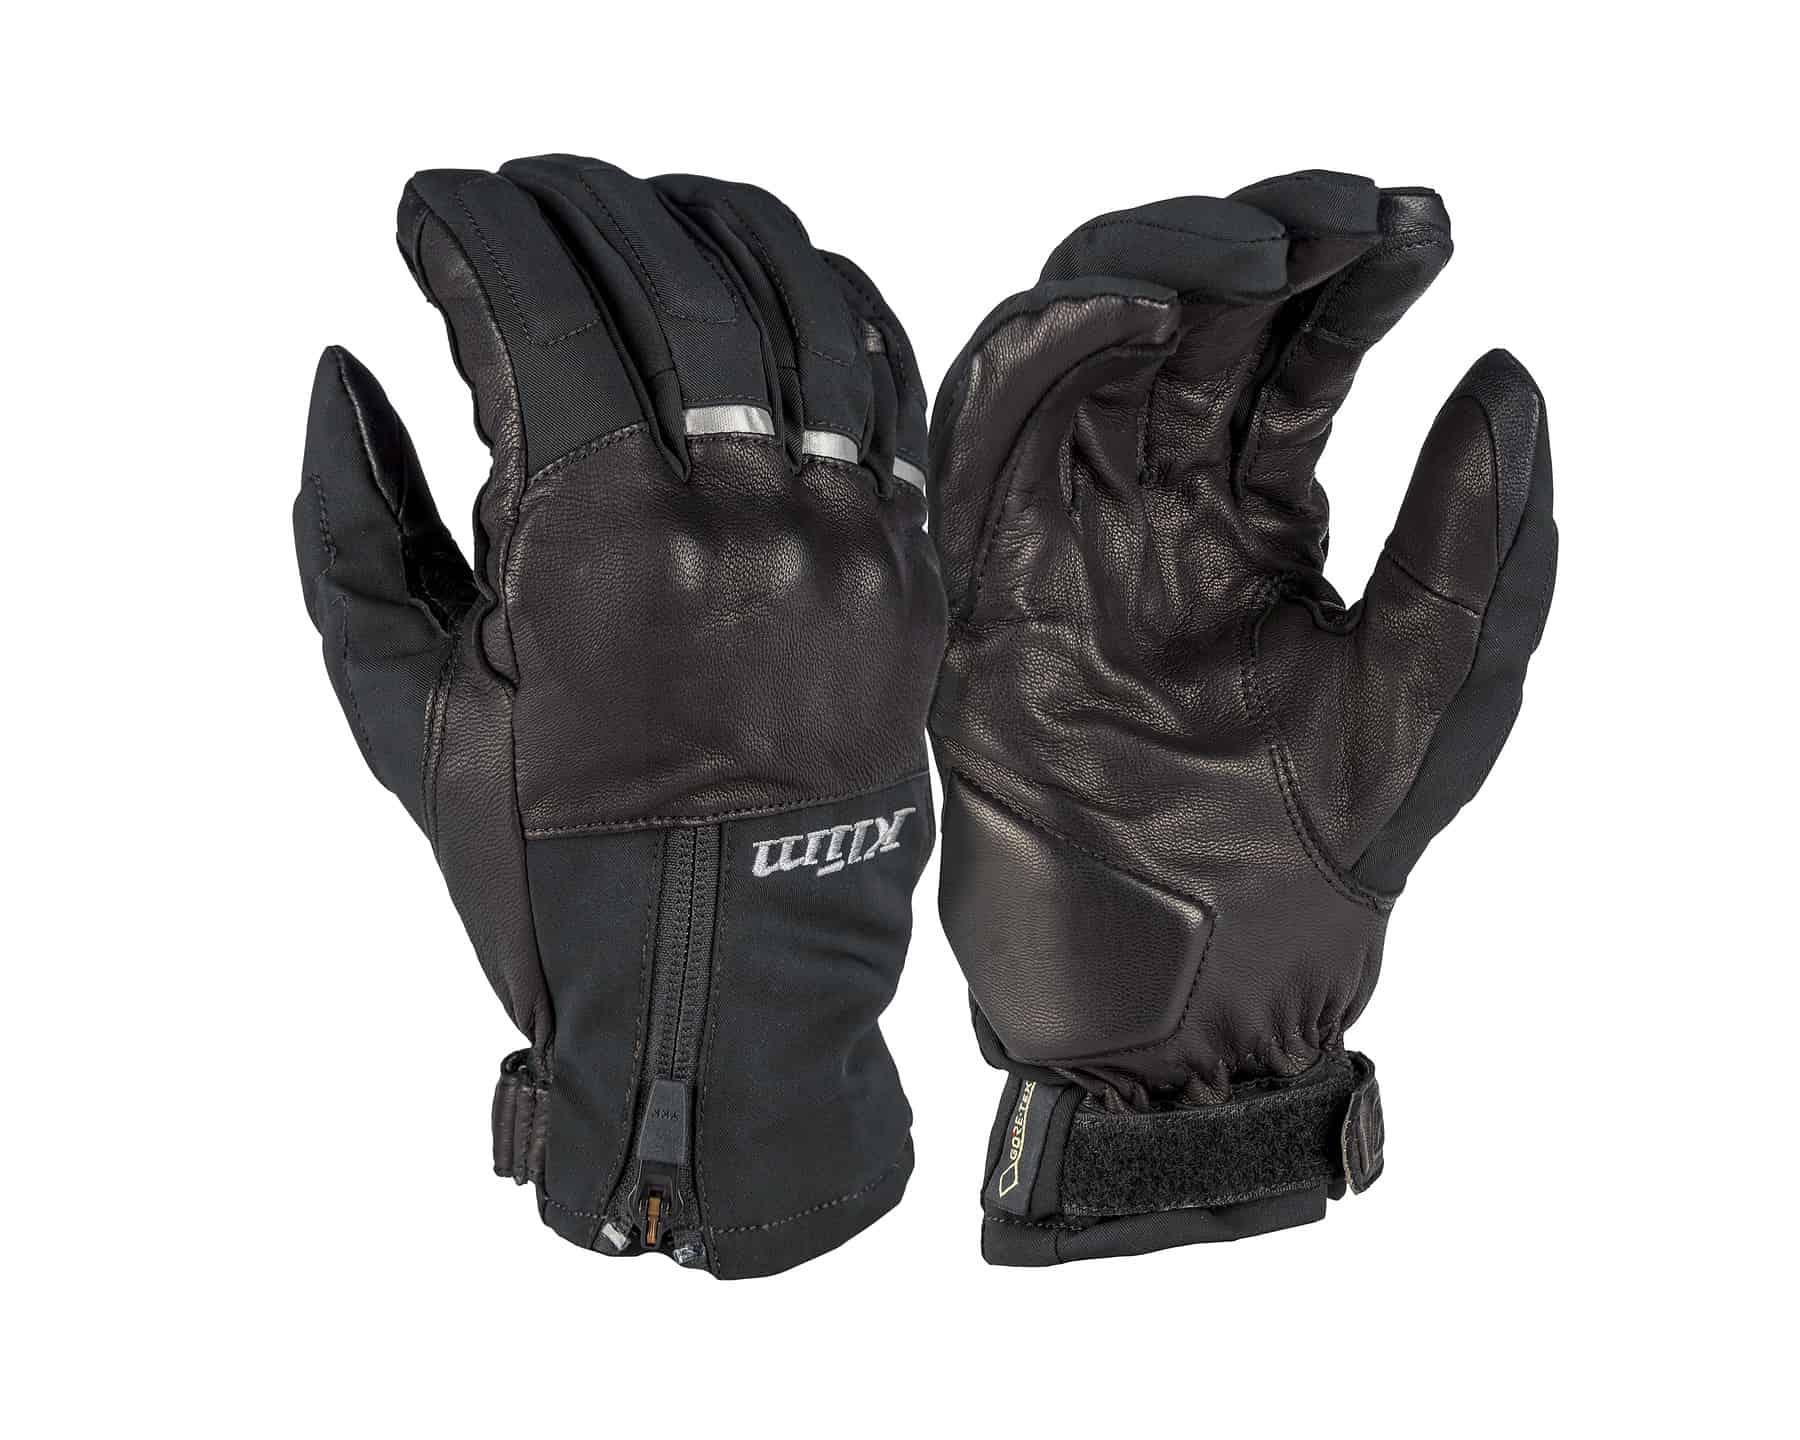 Vanguard GTX Short Glove_3922-000_Black_Secondary_01